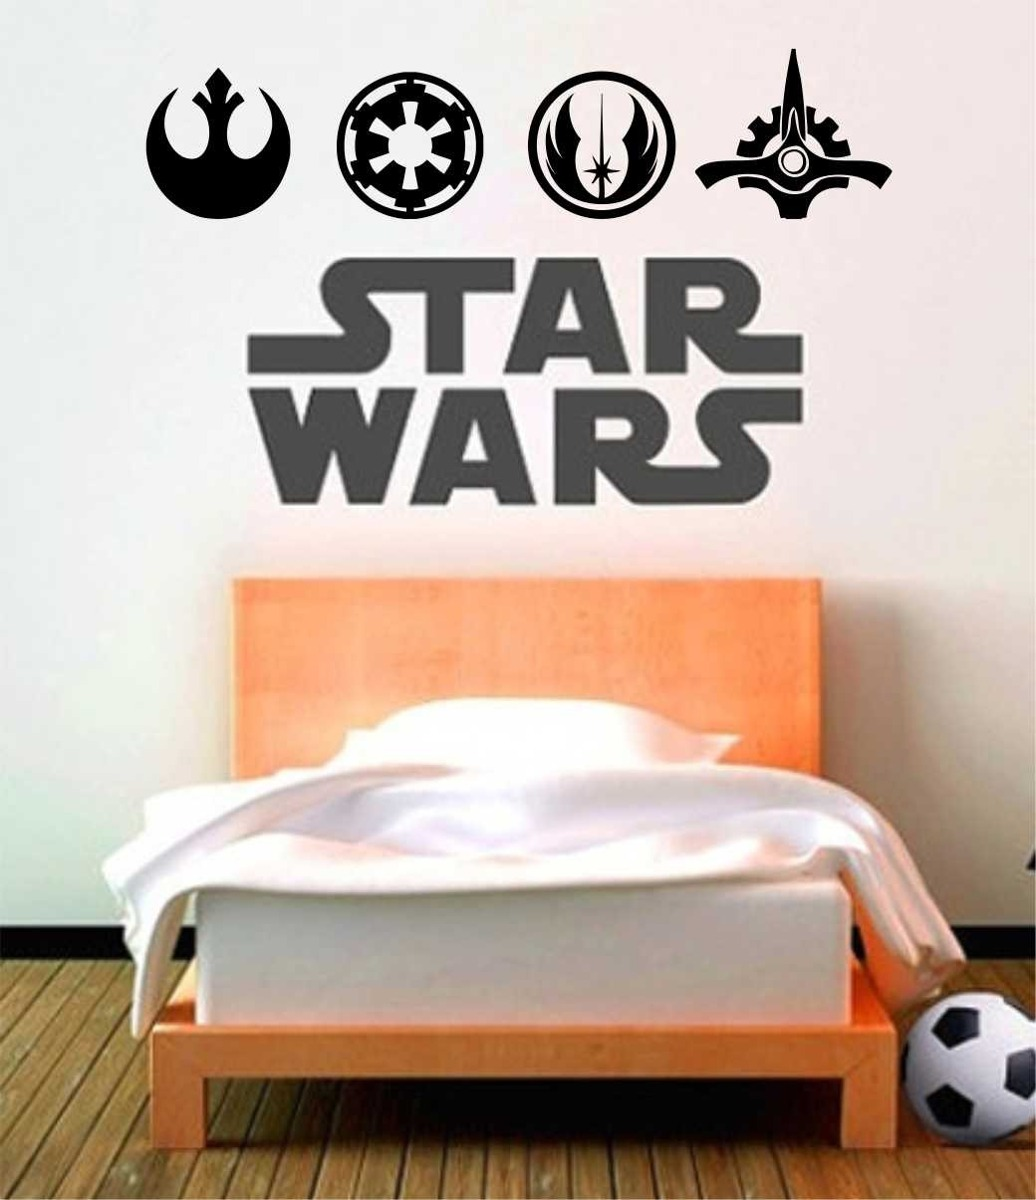 Aparador Cocina Estrecho ~ Adesivo De Parede Star Wars Dartwader Jedy Guerra R$ 79,90 em Mercado Livre